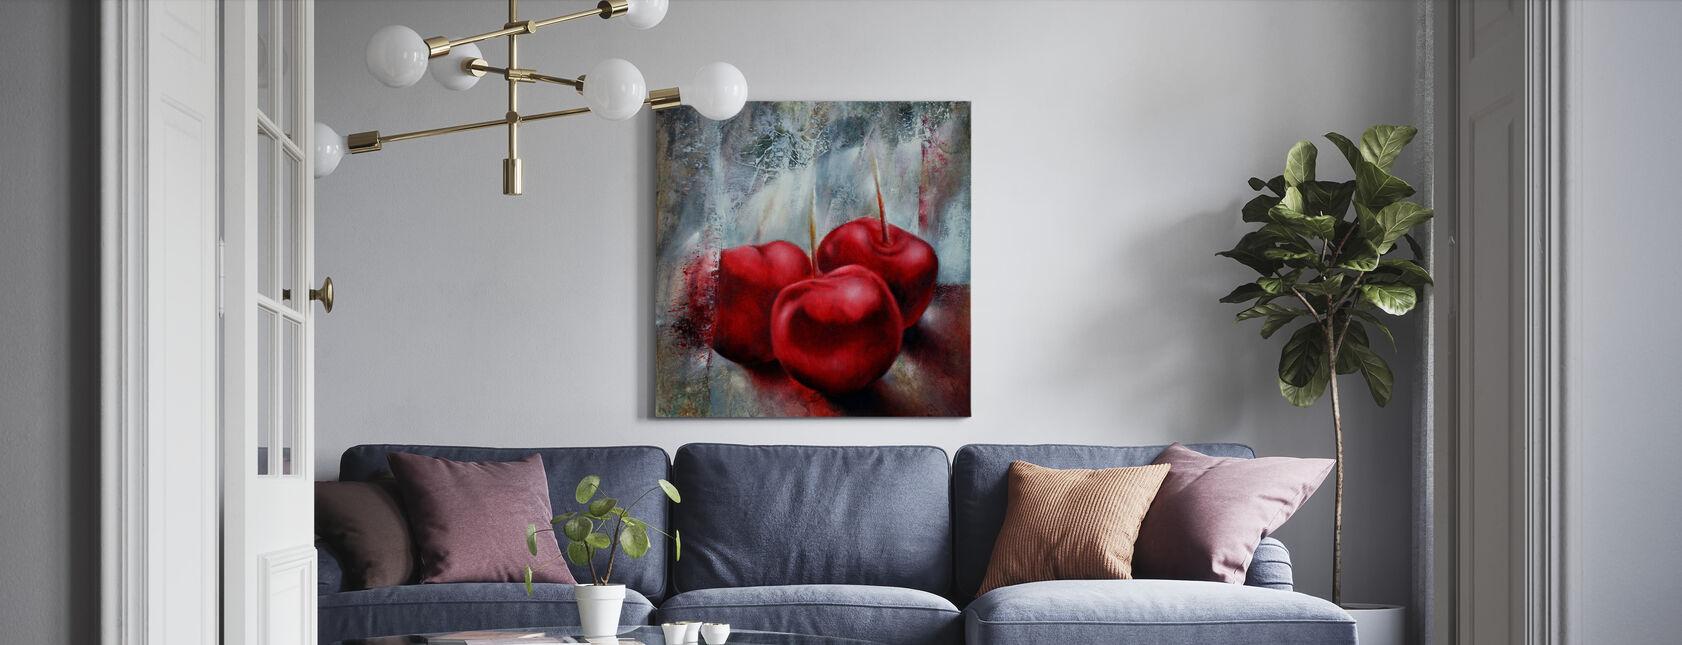 Kersen - Canvas print - Woonkamer